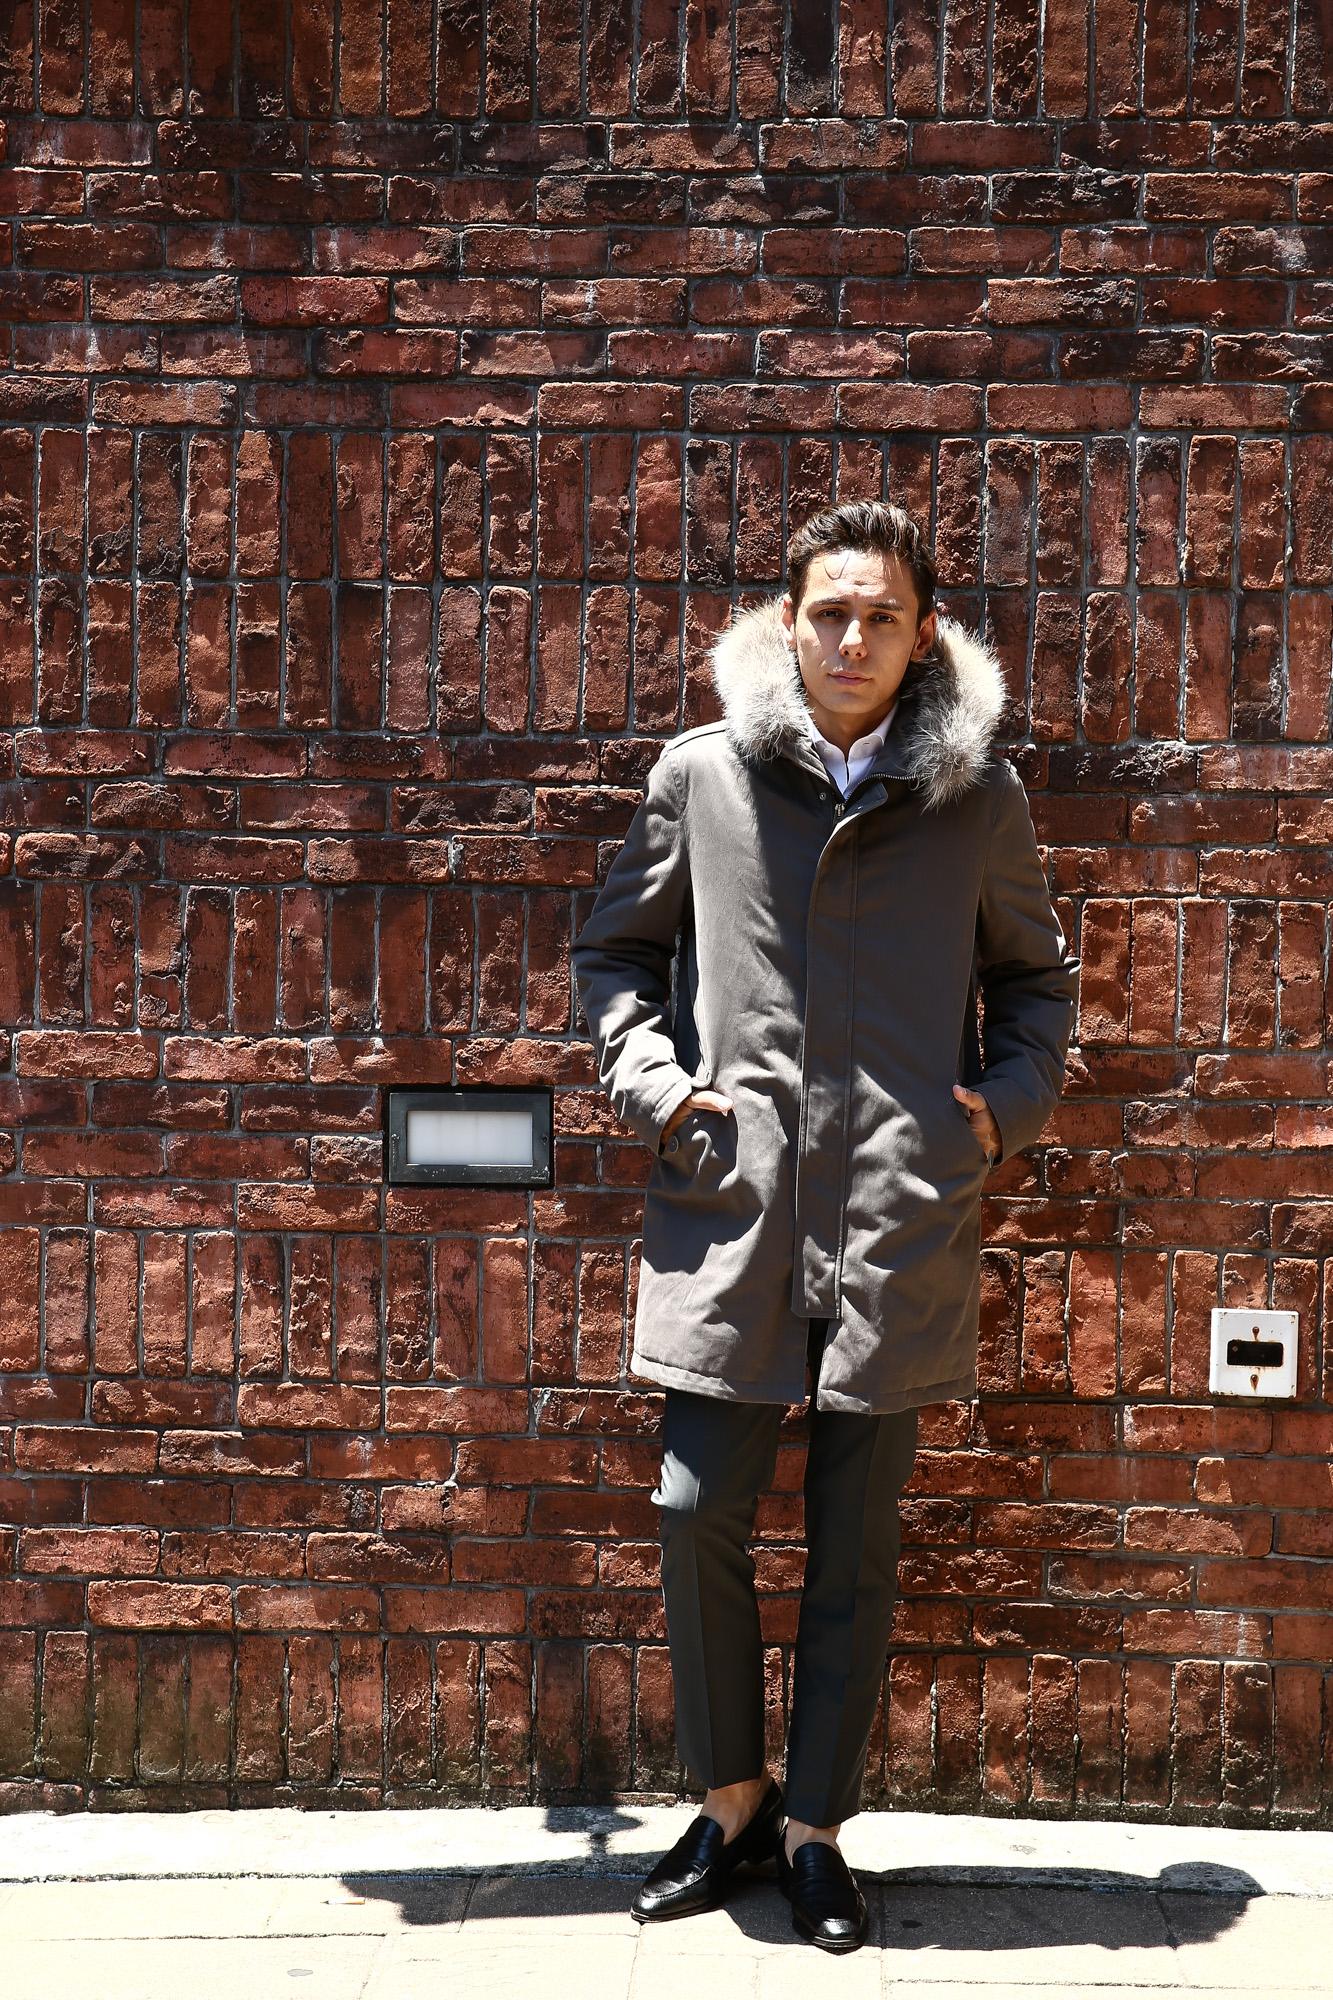 【HERNO / ヘルノ】 PI0404U SUB-ZERO M51 Mods coat (サブゼロ M51 モッズコート) ファー付き ダウン モッズコート GRAY (グレー・8600) 2017 秋冬 愛知 名古屋 herno ヘルノ ダウンコート 42,44,46,48,50,52,54